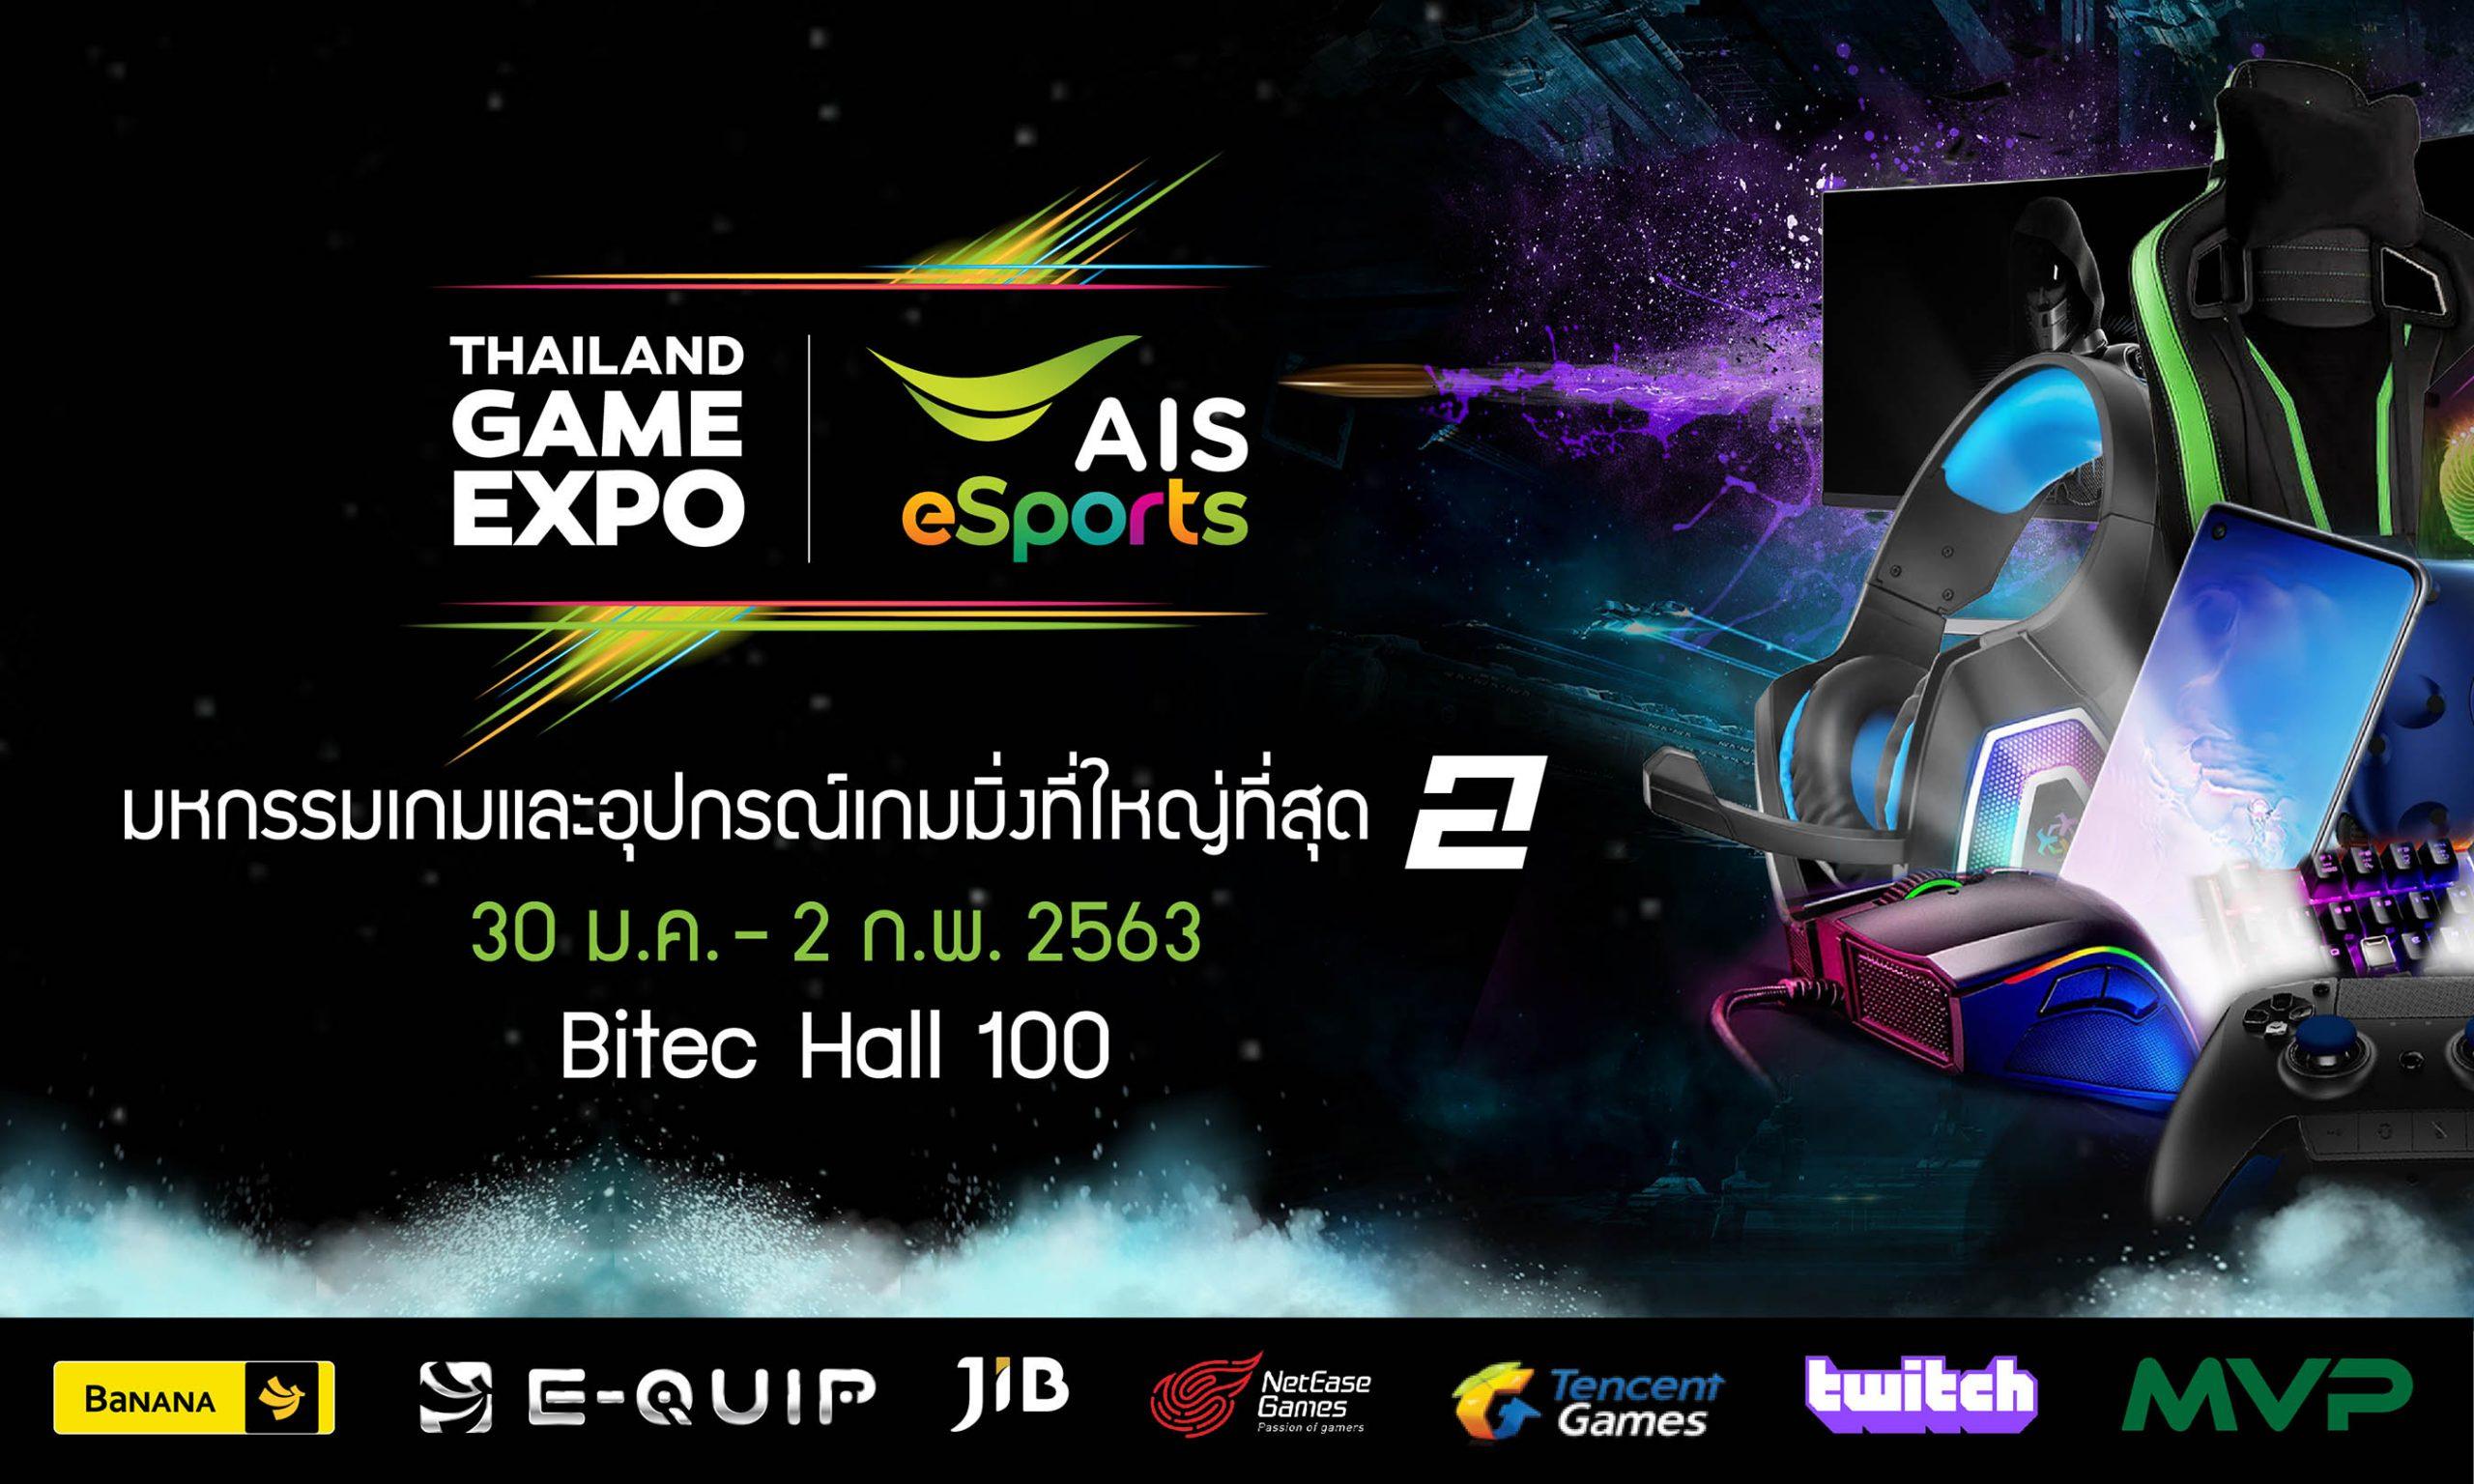 Thailand Game Expo by AIS eSports 2